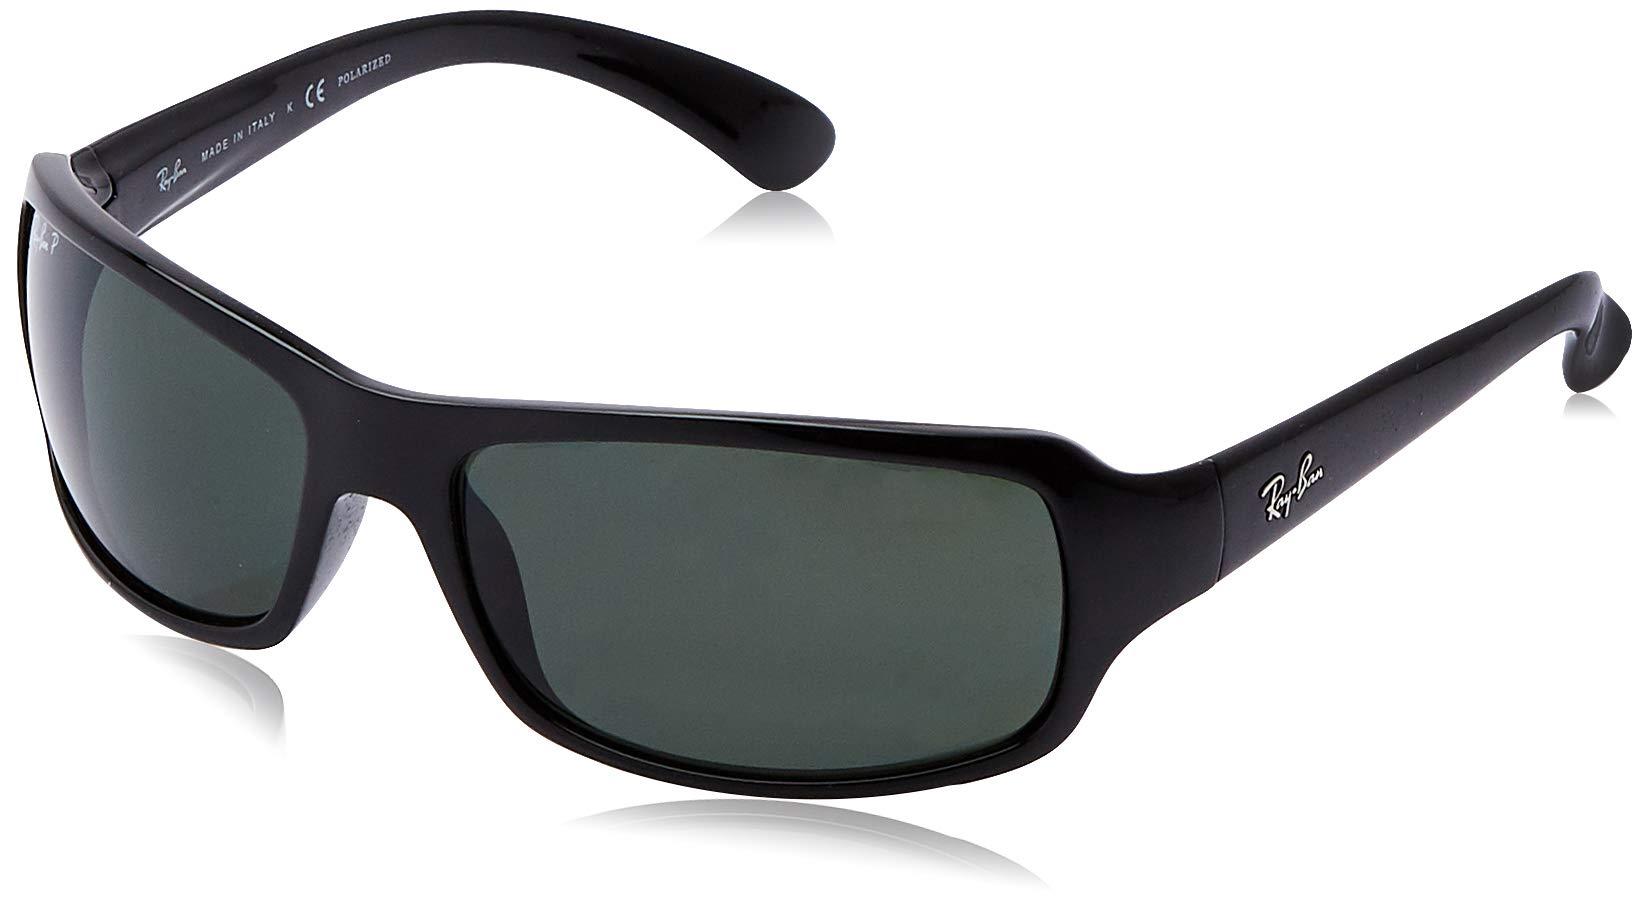 RAY-BAN RB4075 Rectangular Sunglasses, Black/Polarized Green, 61 mm by RAY-BAN